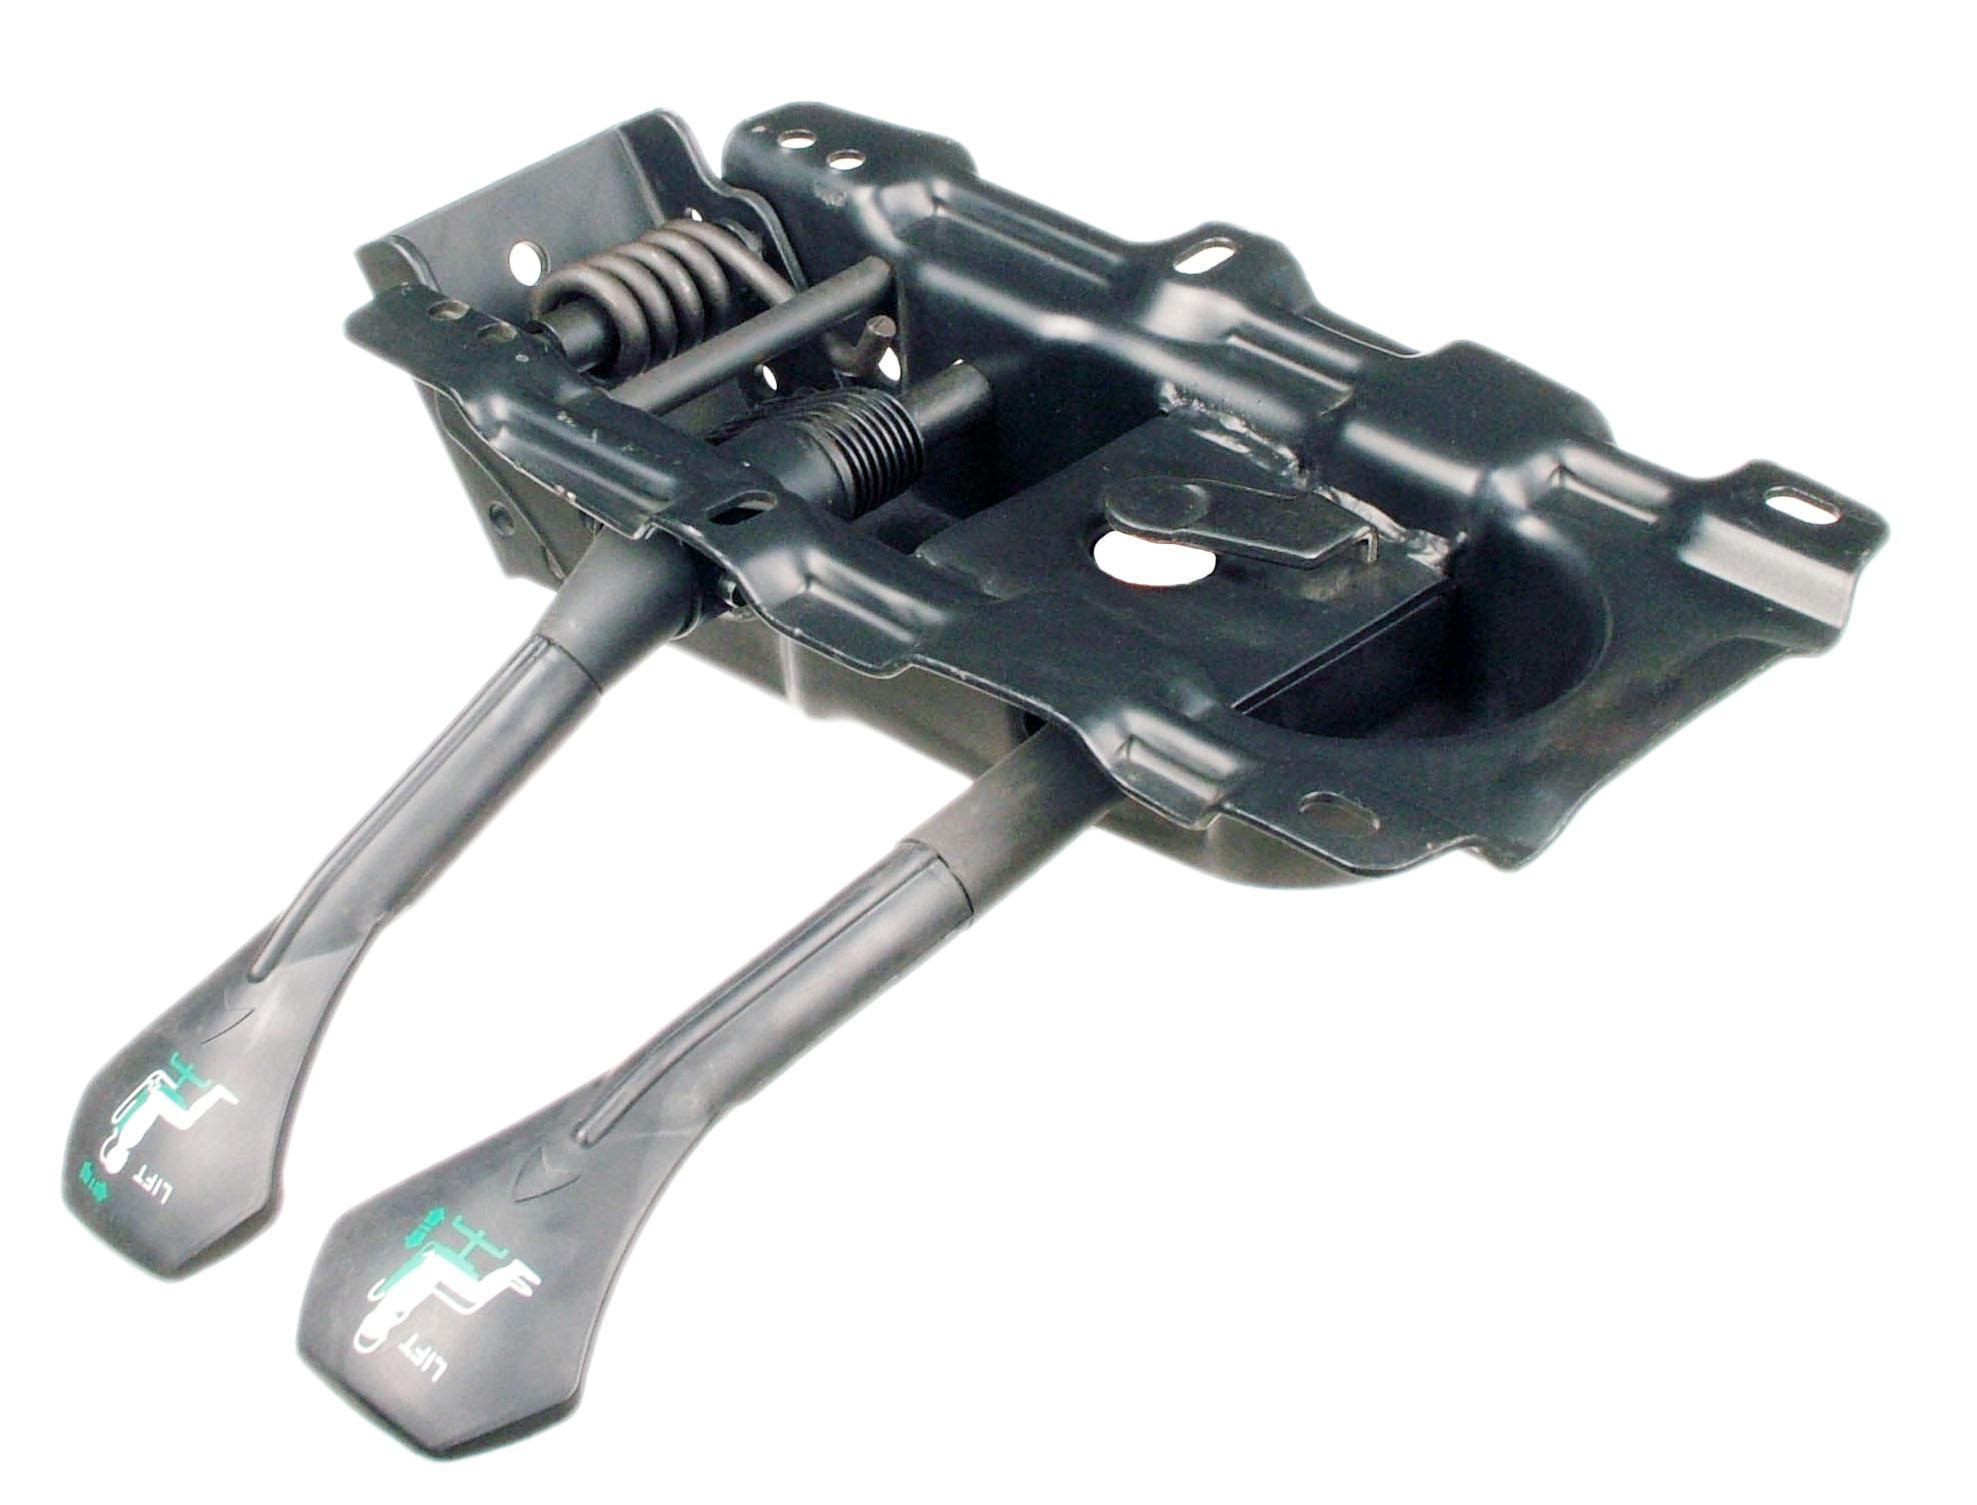 YM6601多功能转椅底盘.jpg